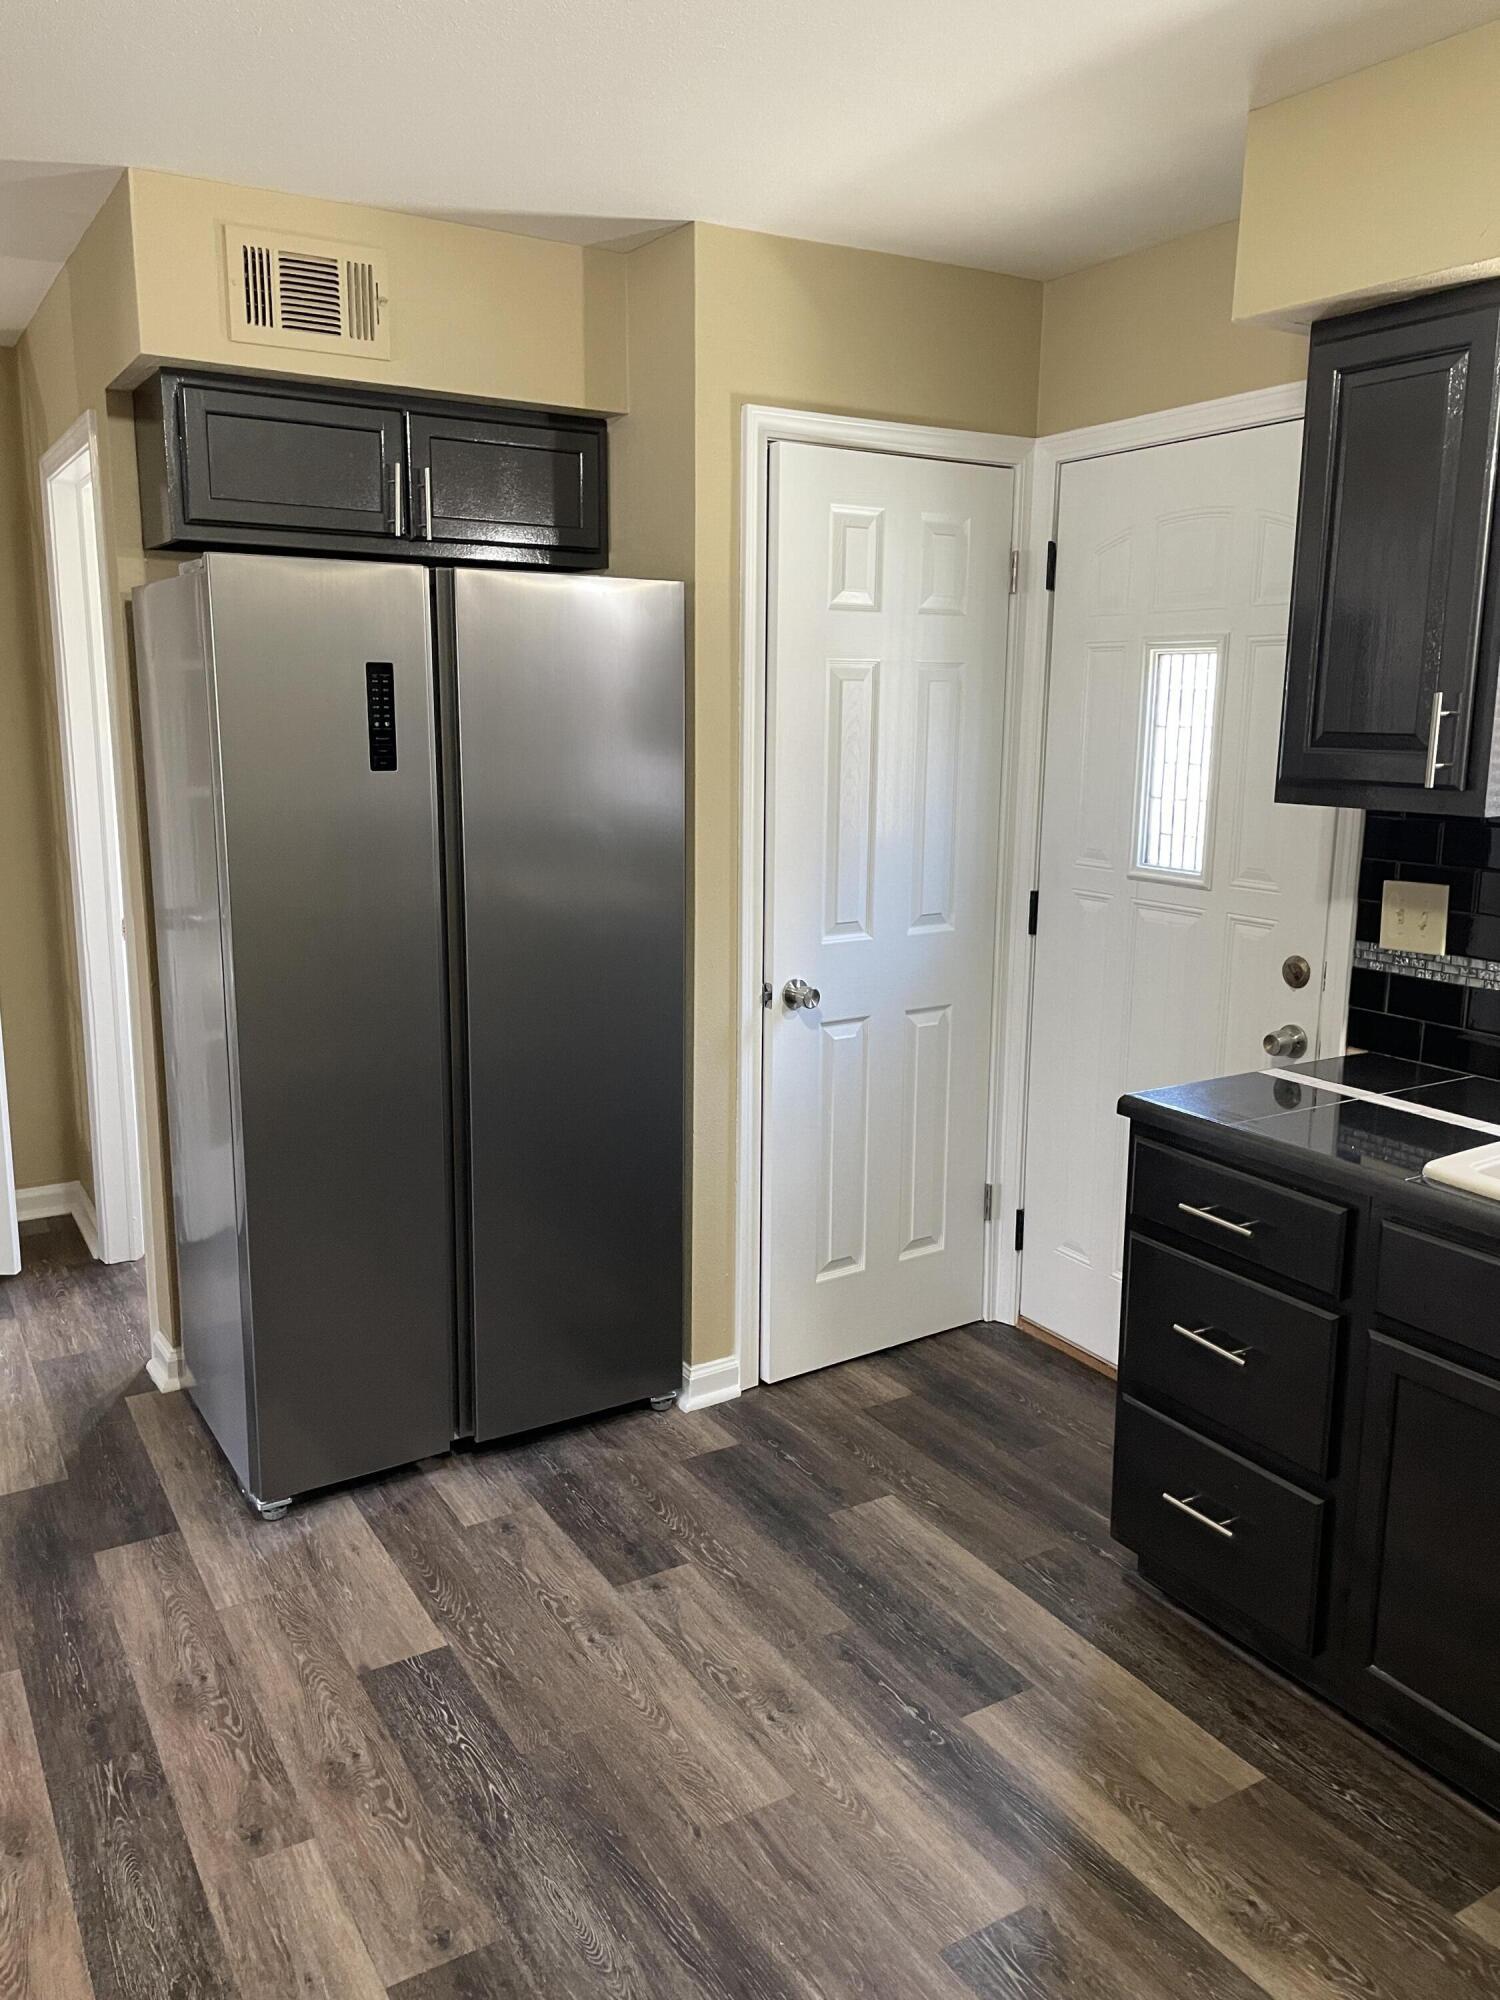 SS appliances